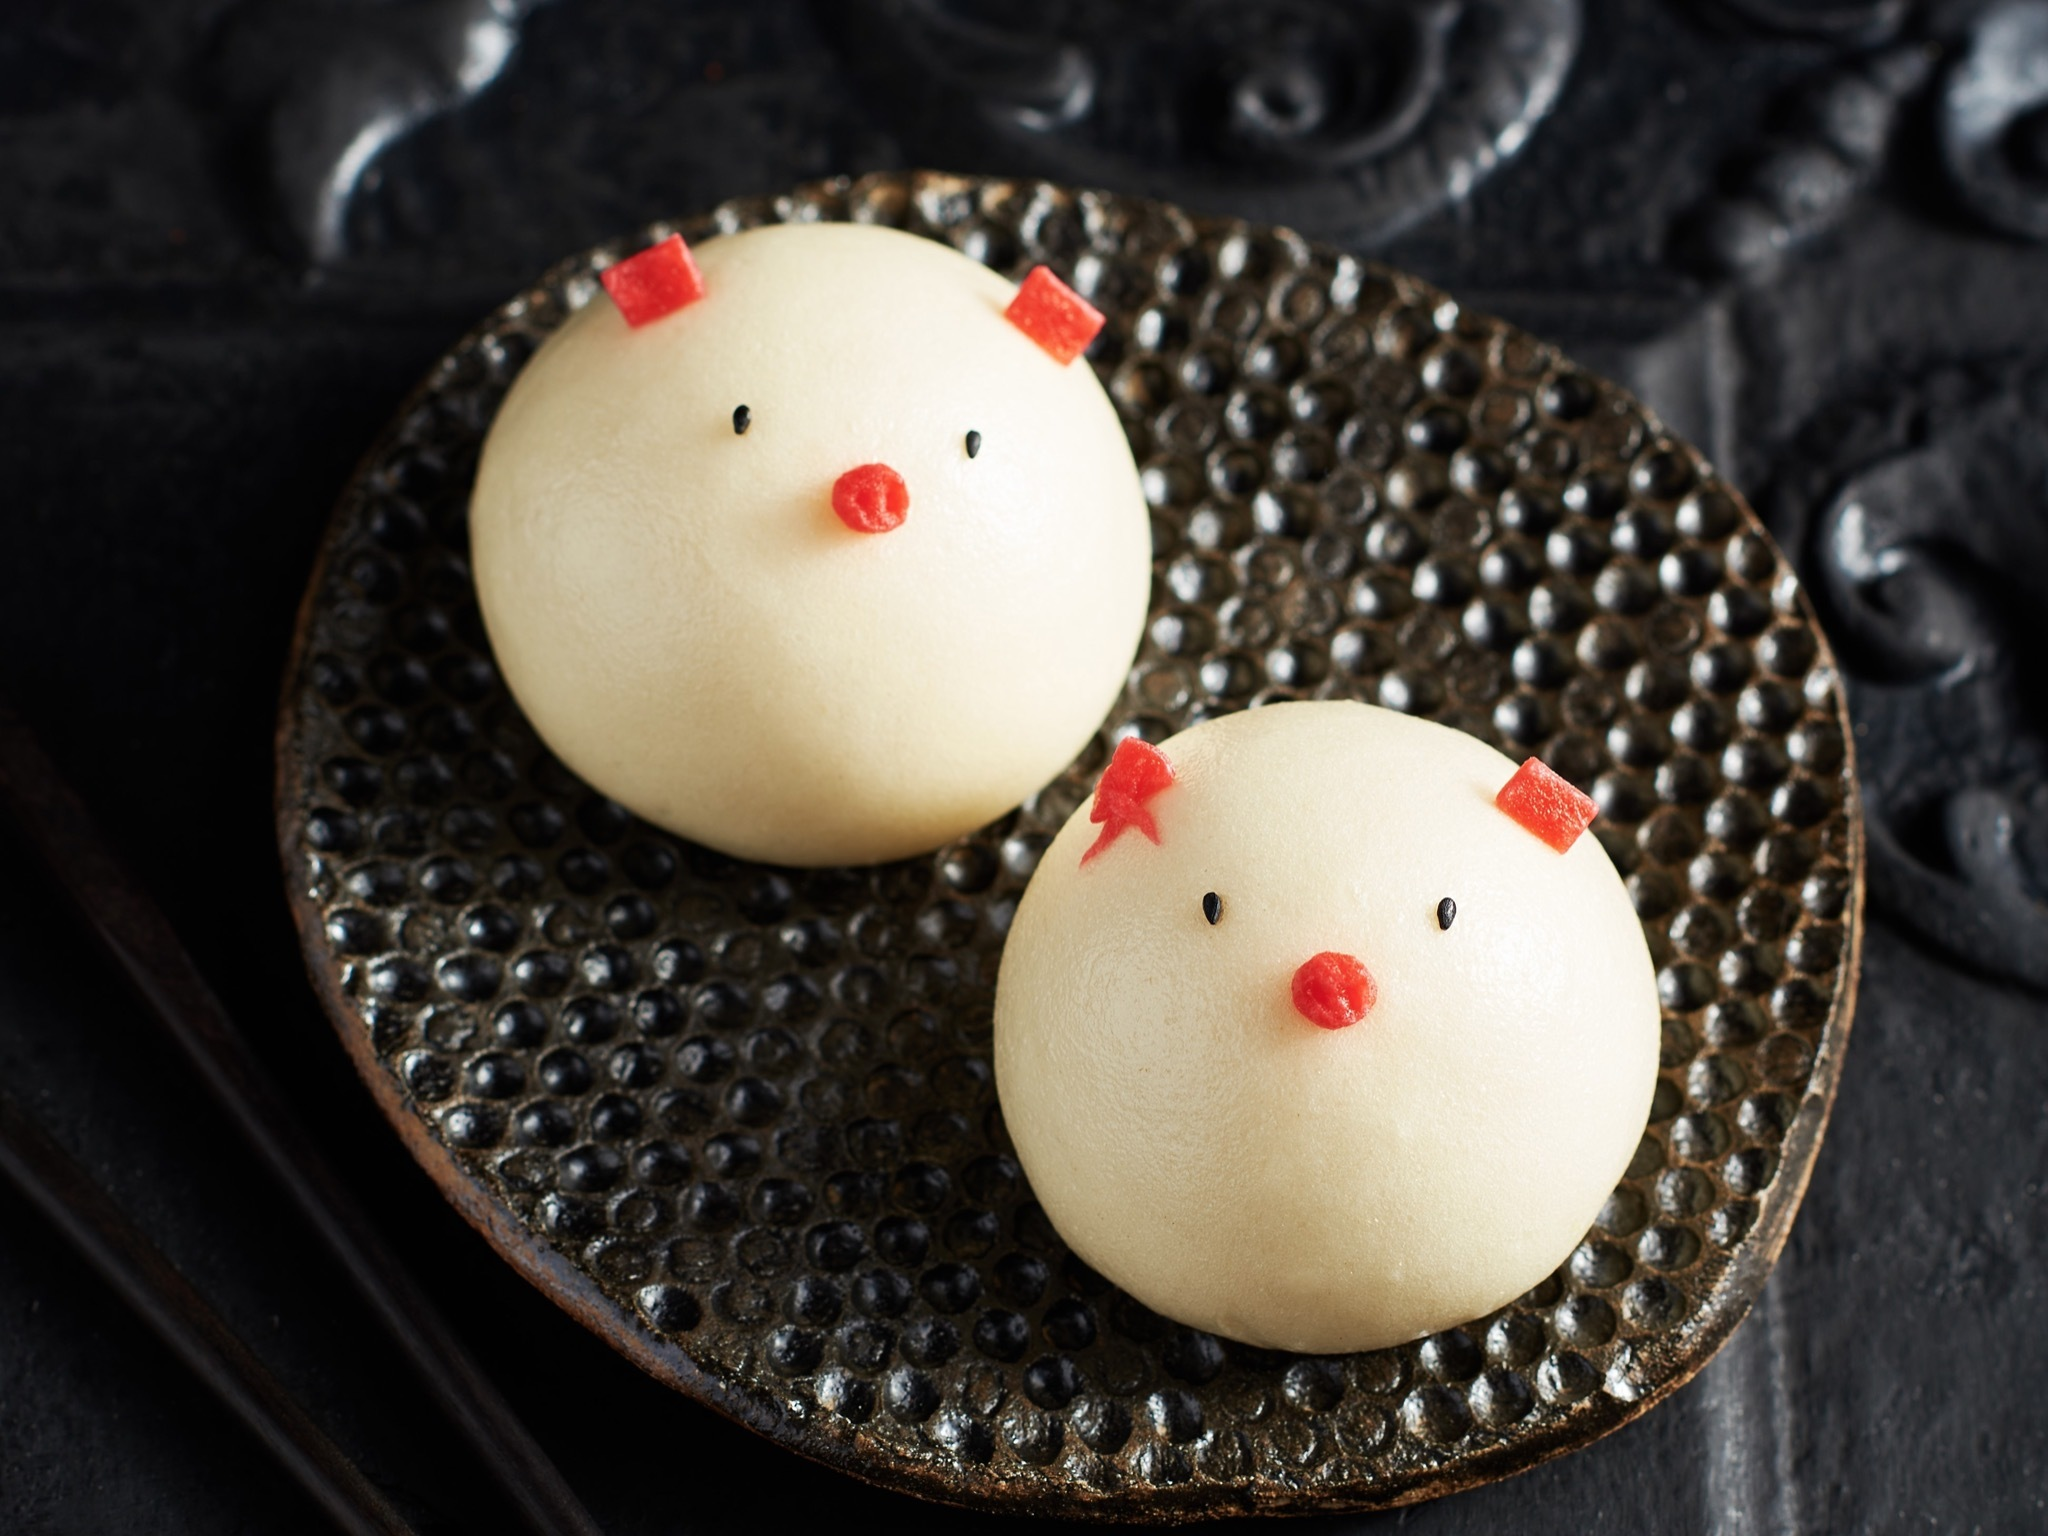 Two dumplings made to look like pigs